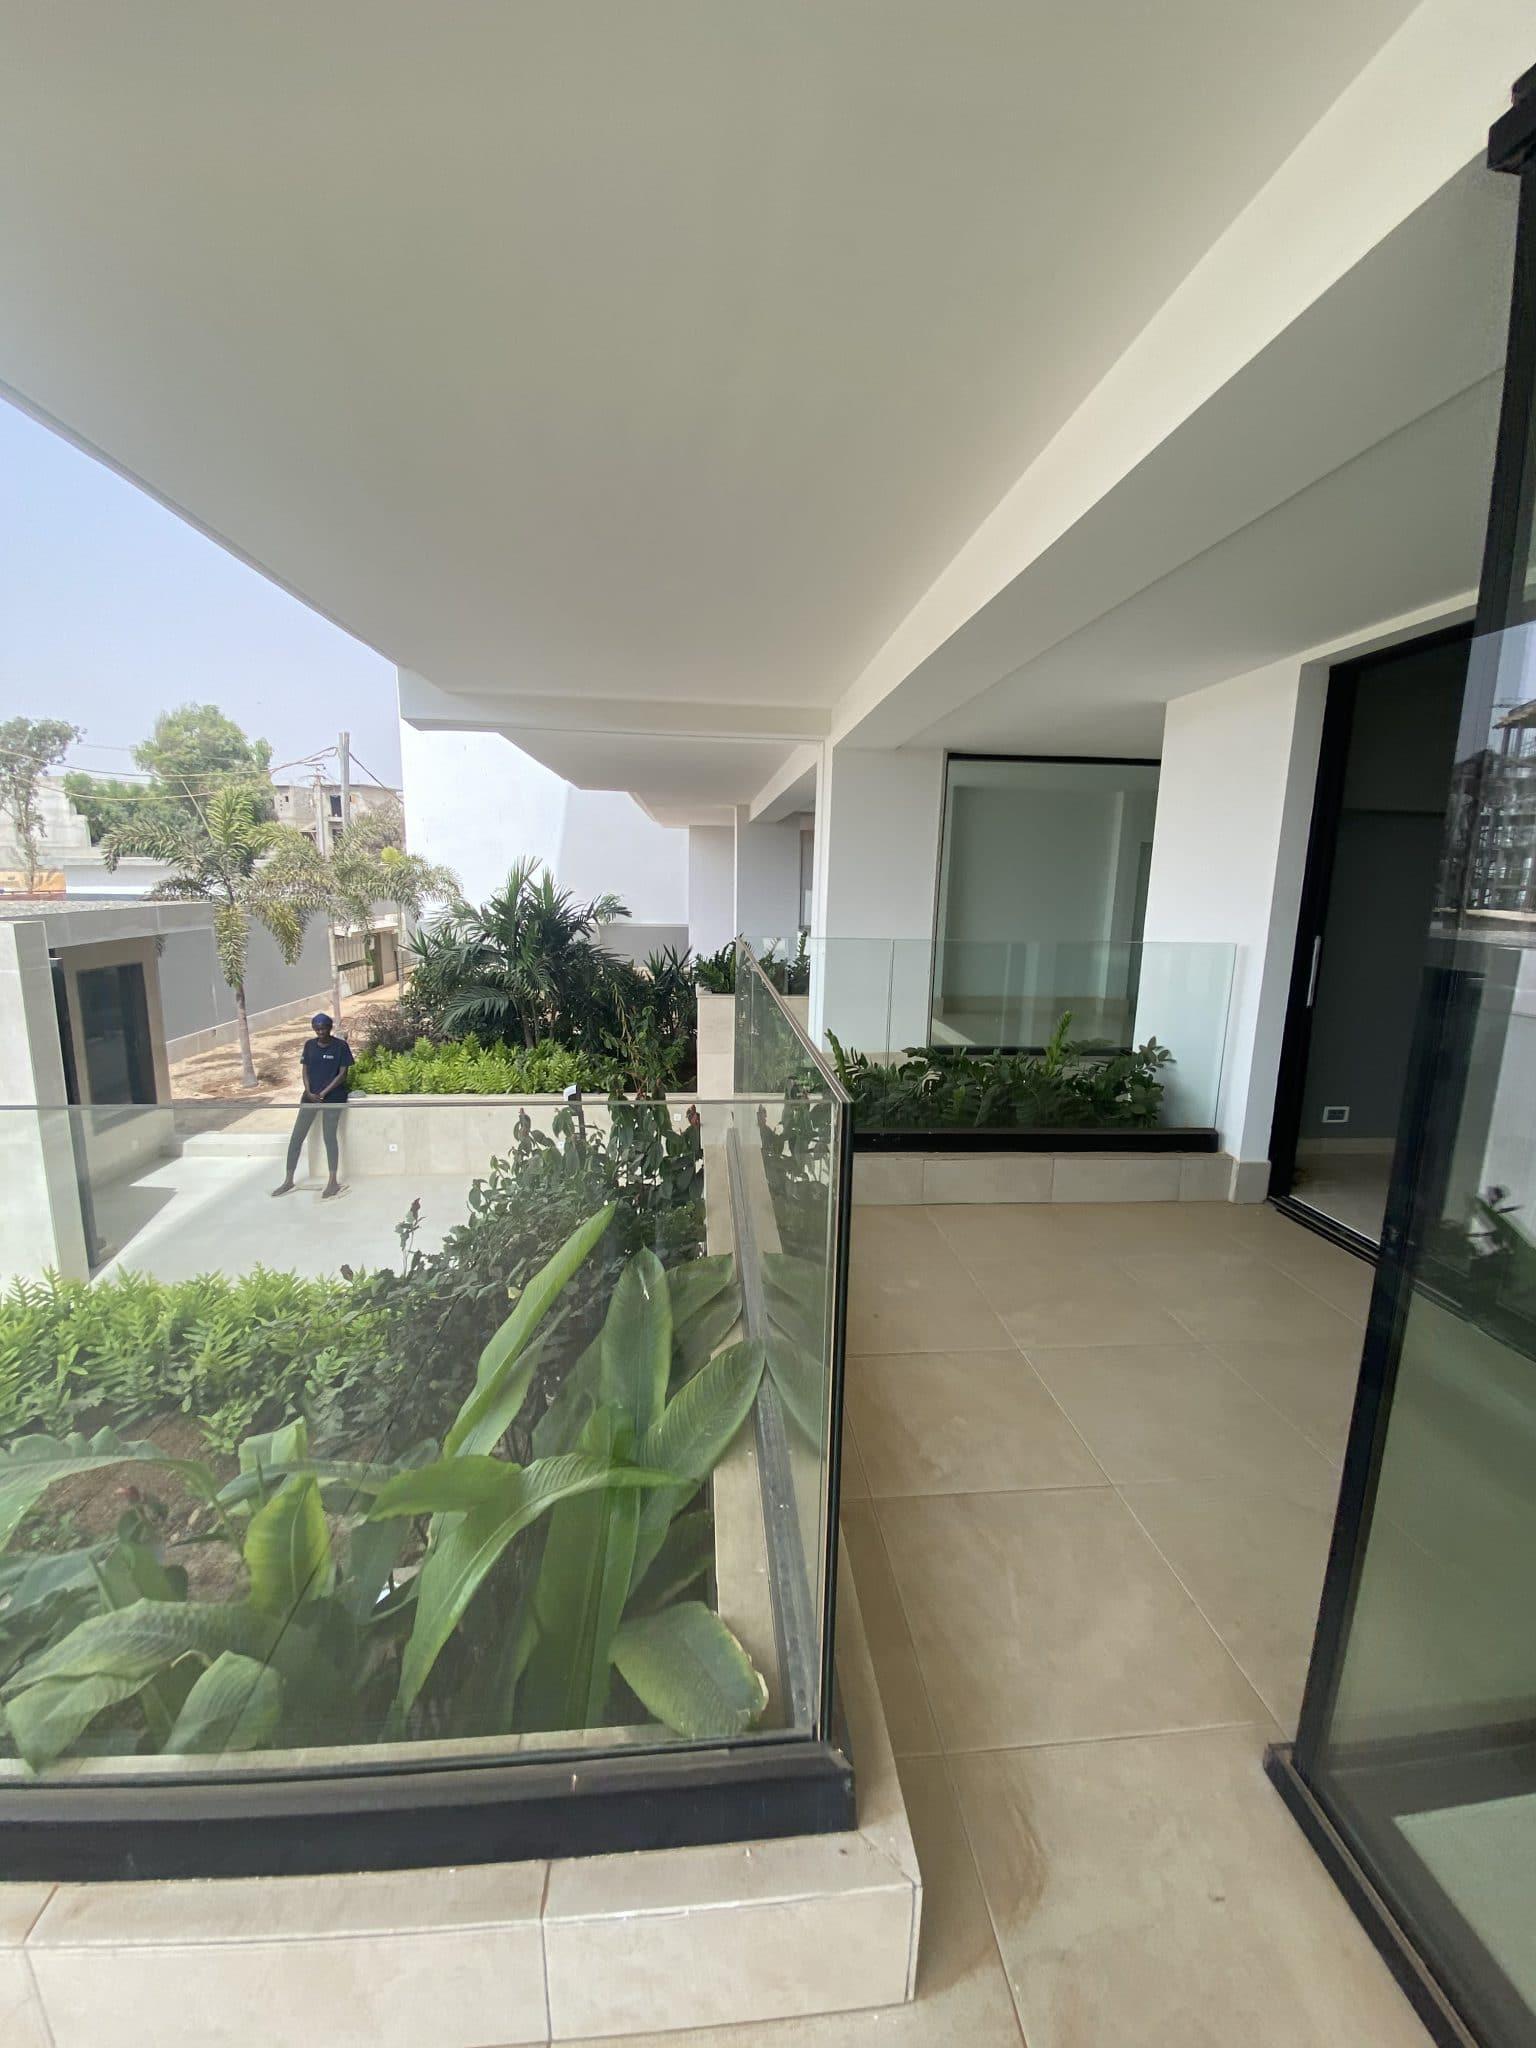 Appartement haut standing à louer à usage mixte Almadies Dakar